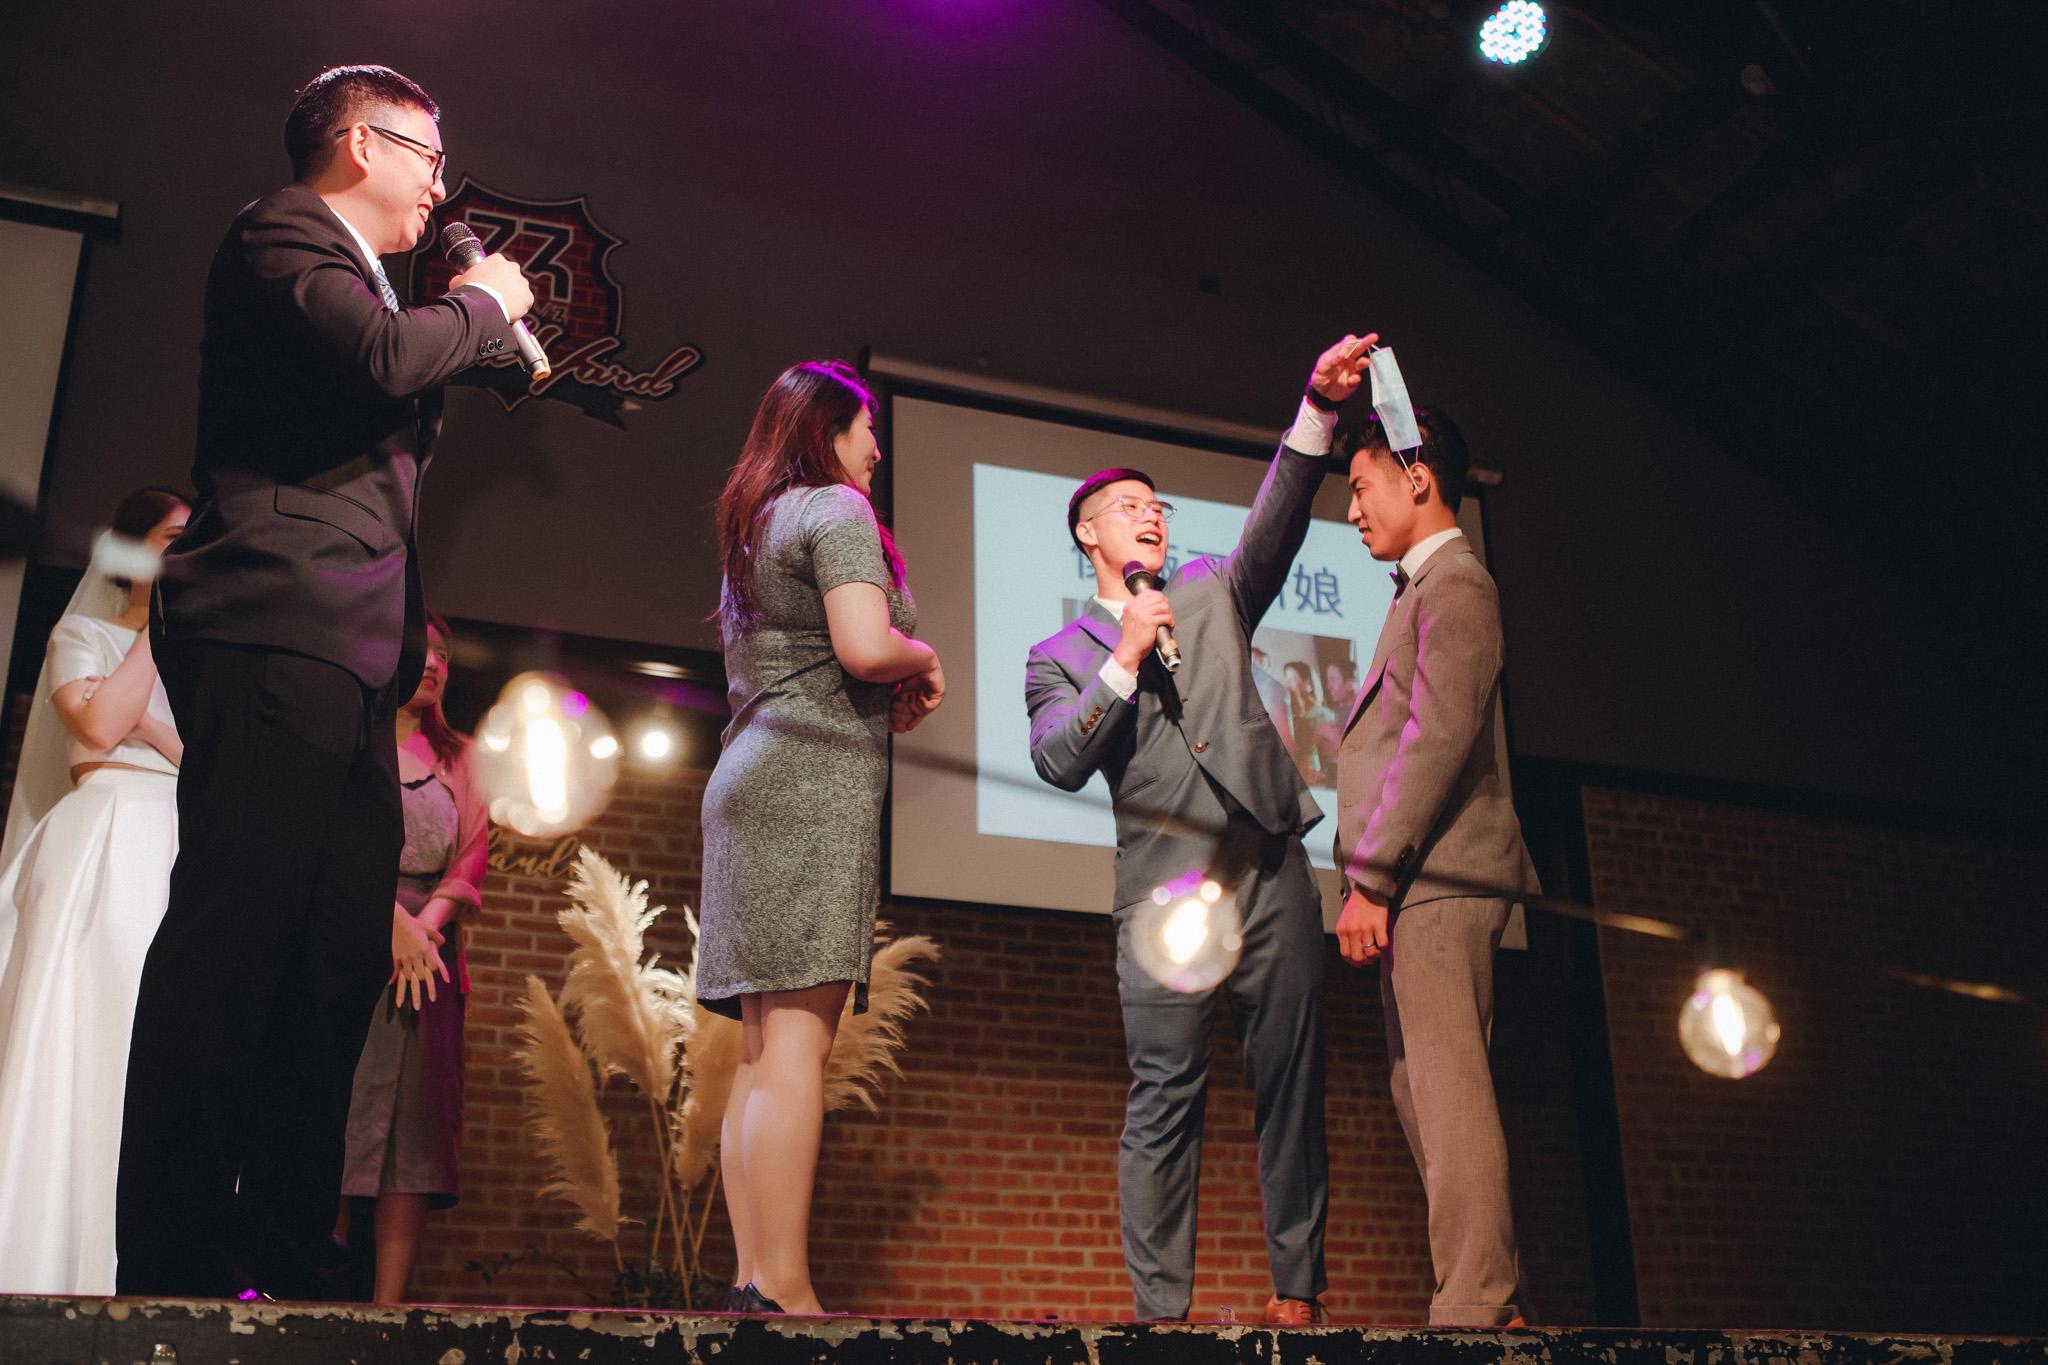 EW 台北婚攝 居米 濟南教會 Brick Yard 33 美軍俱樂部 婚禮 婚宴-89